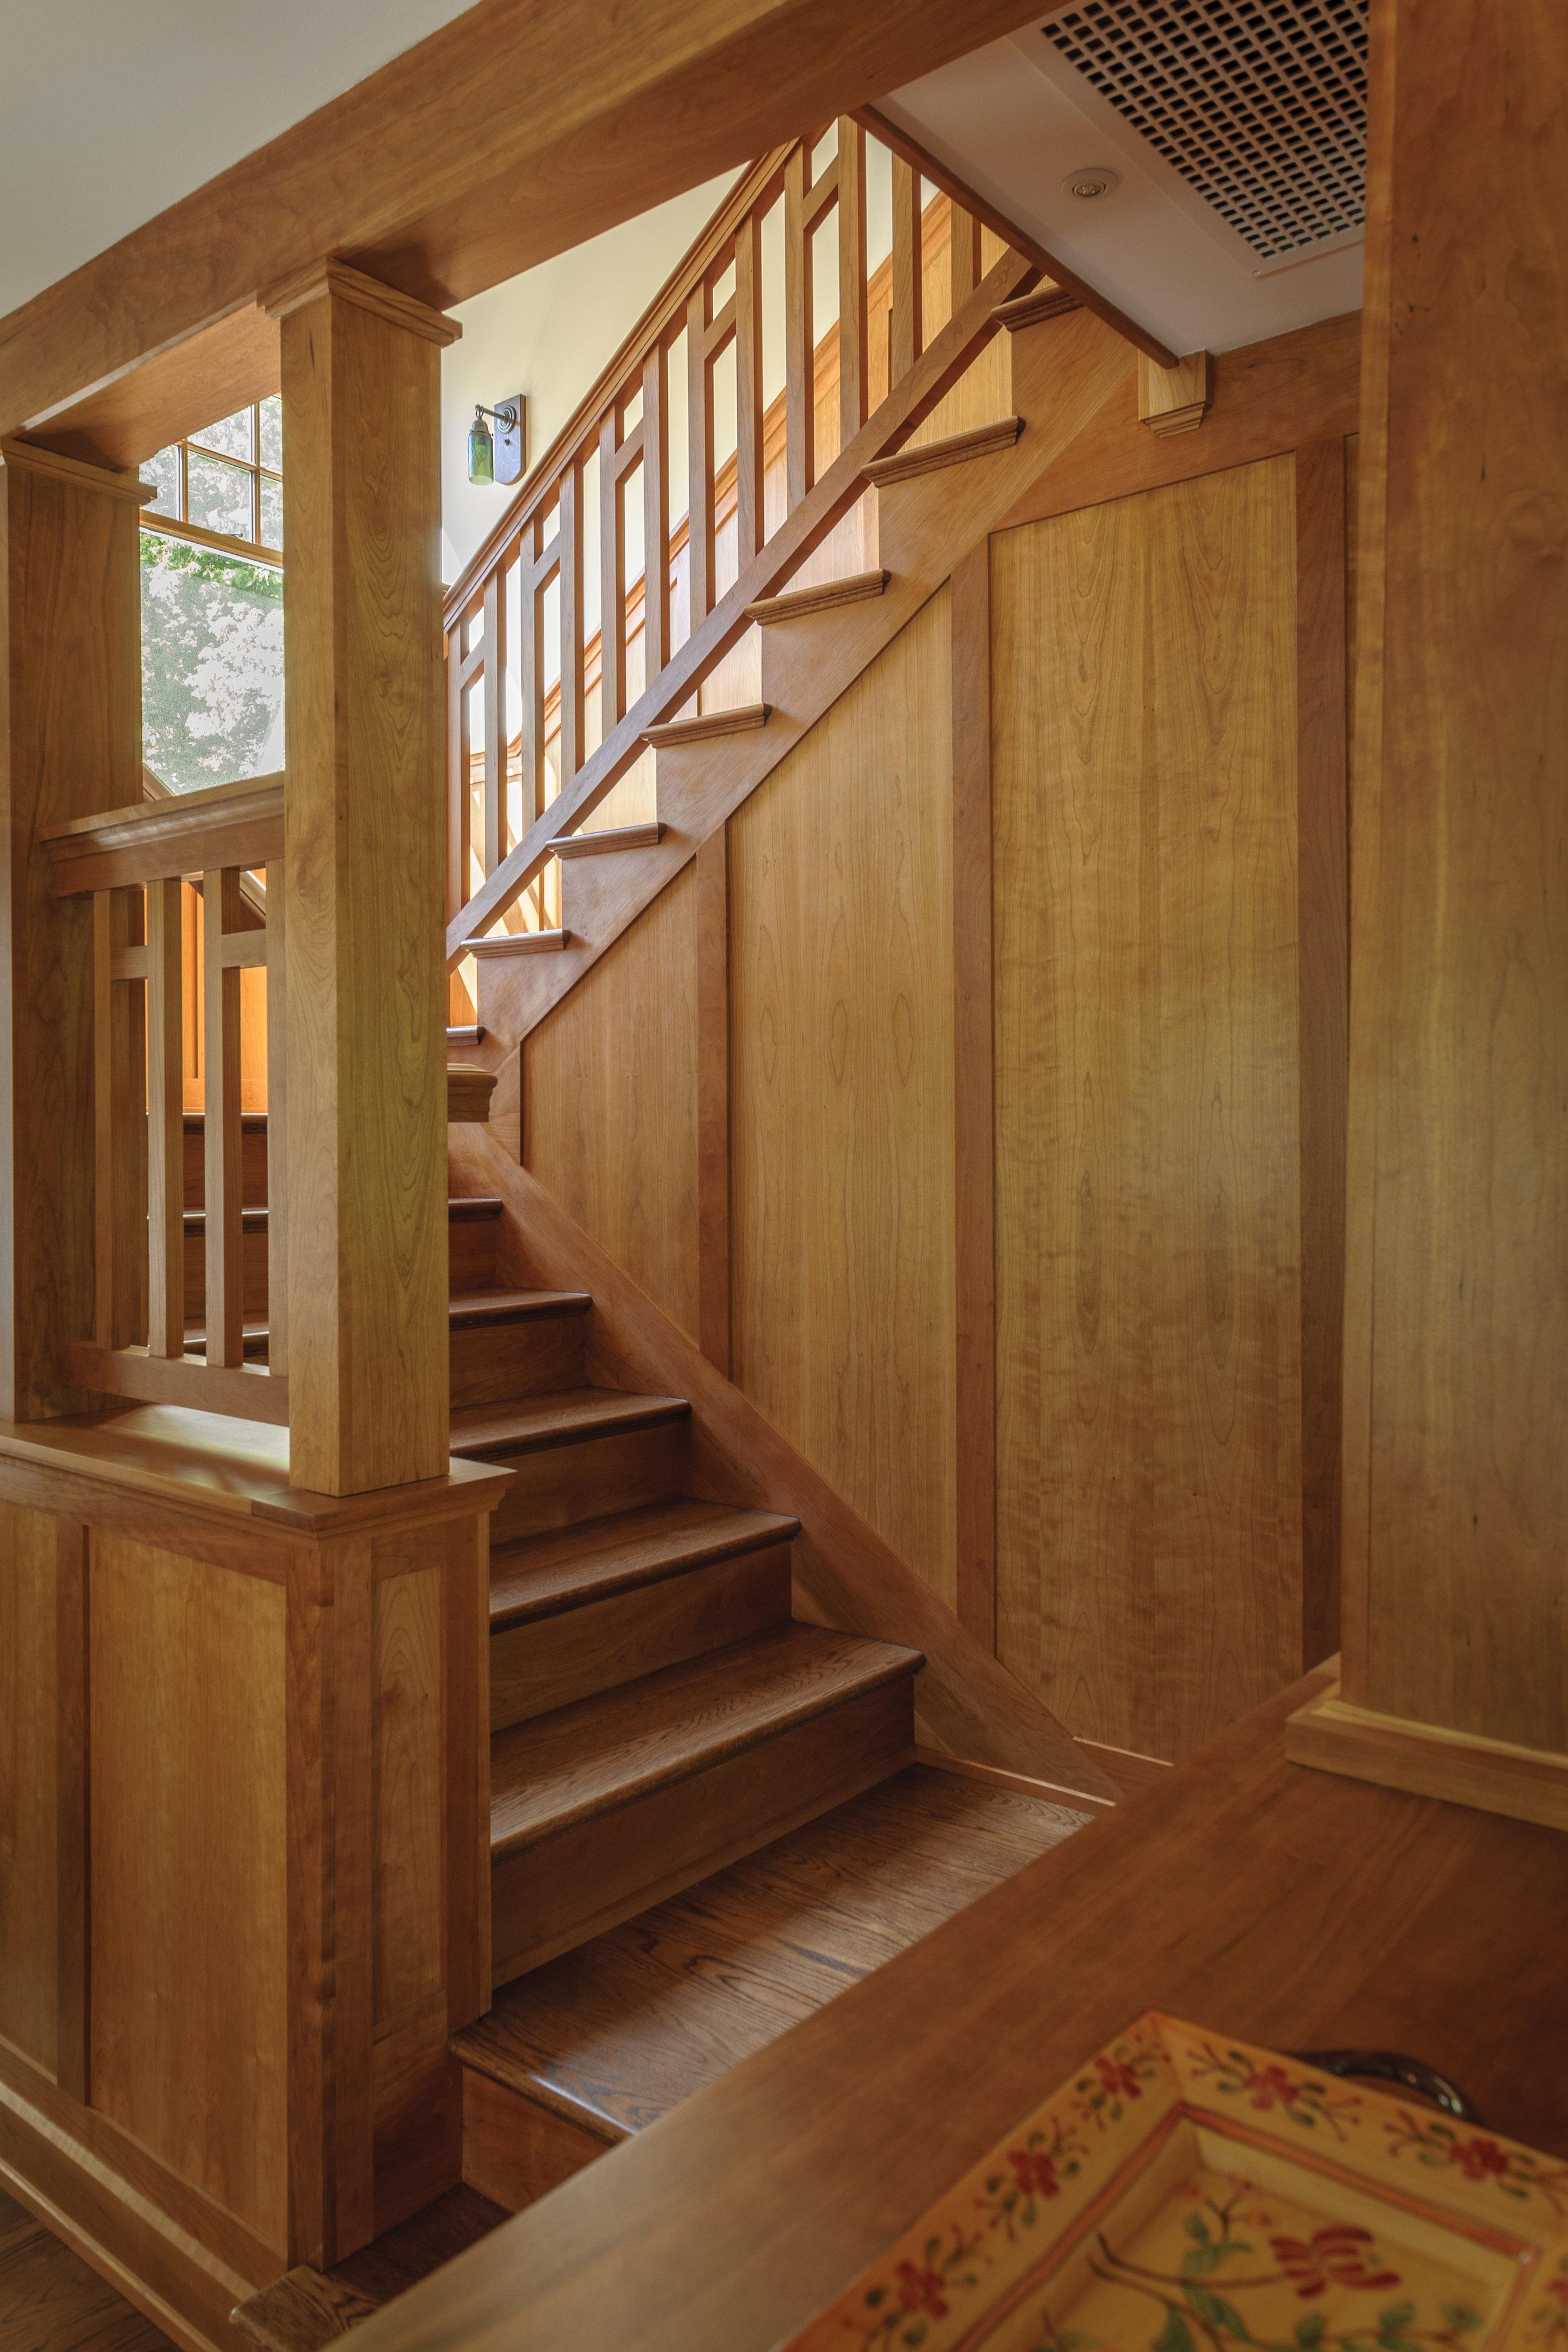 Clites_craftsmanbungalow_stairs.jpg